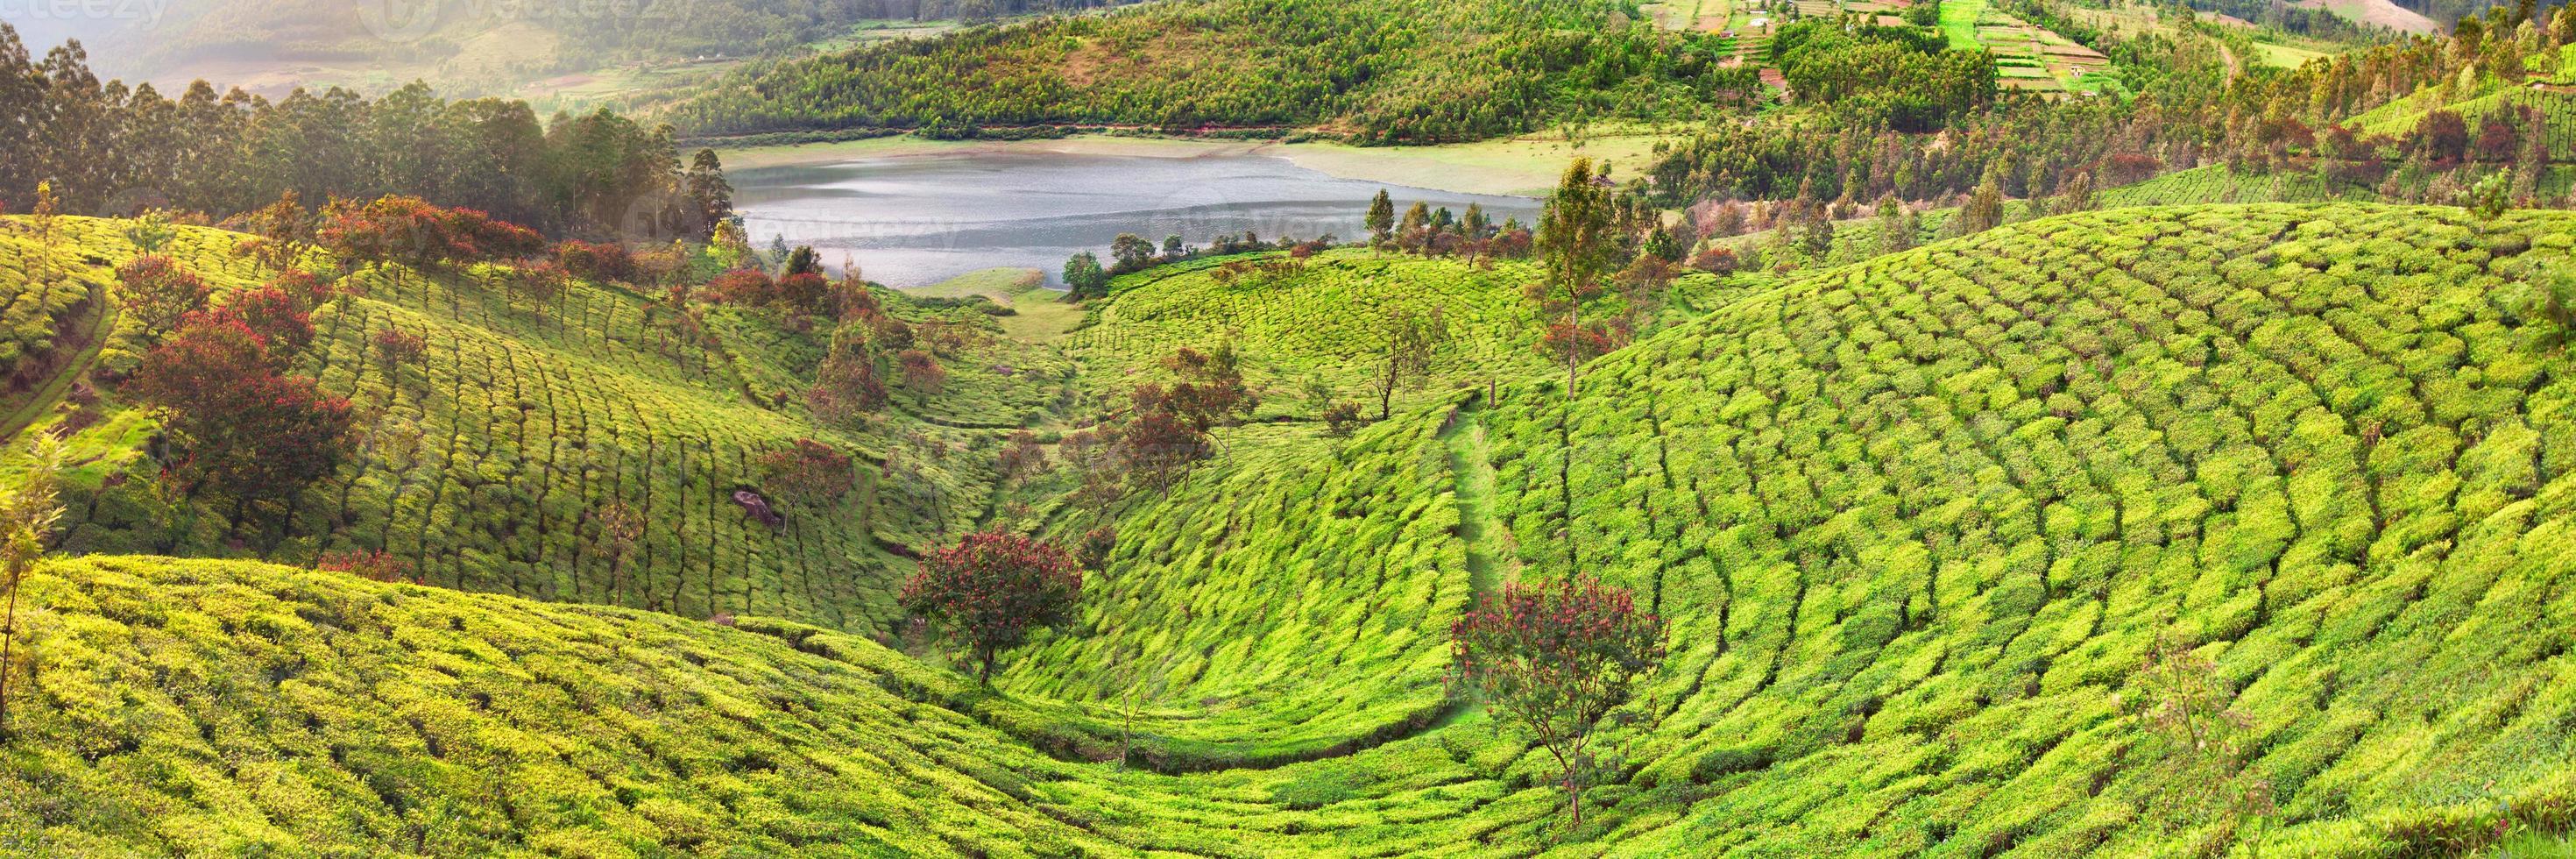 teplantage i Munnar, Indien foto